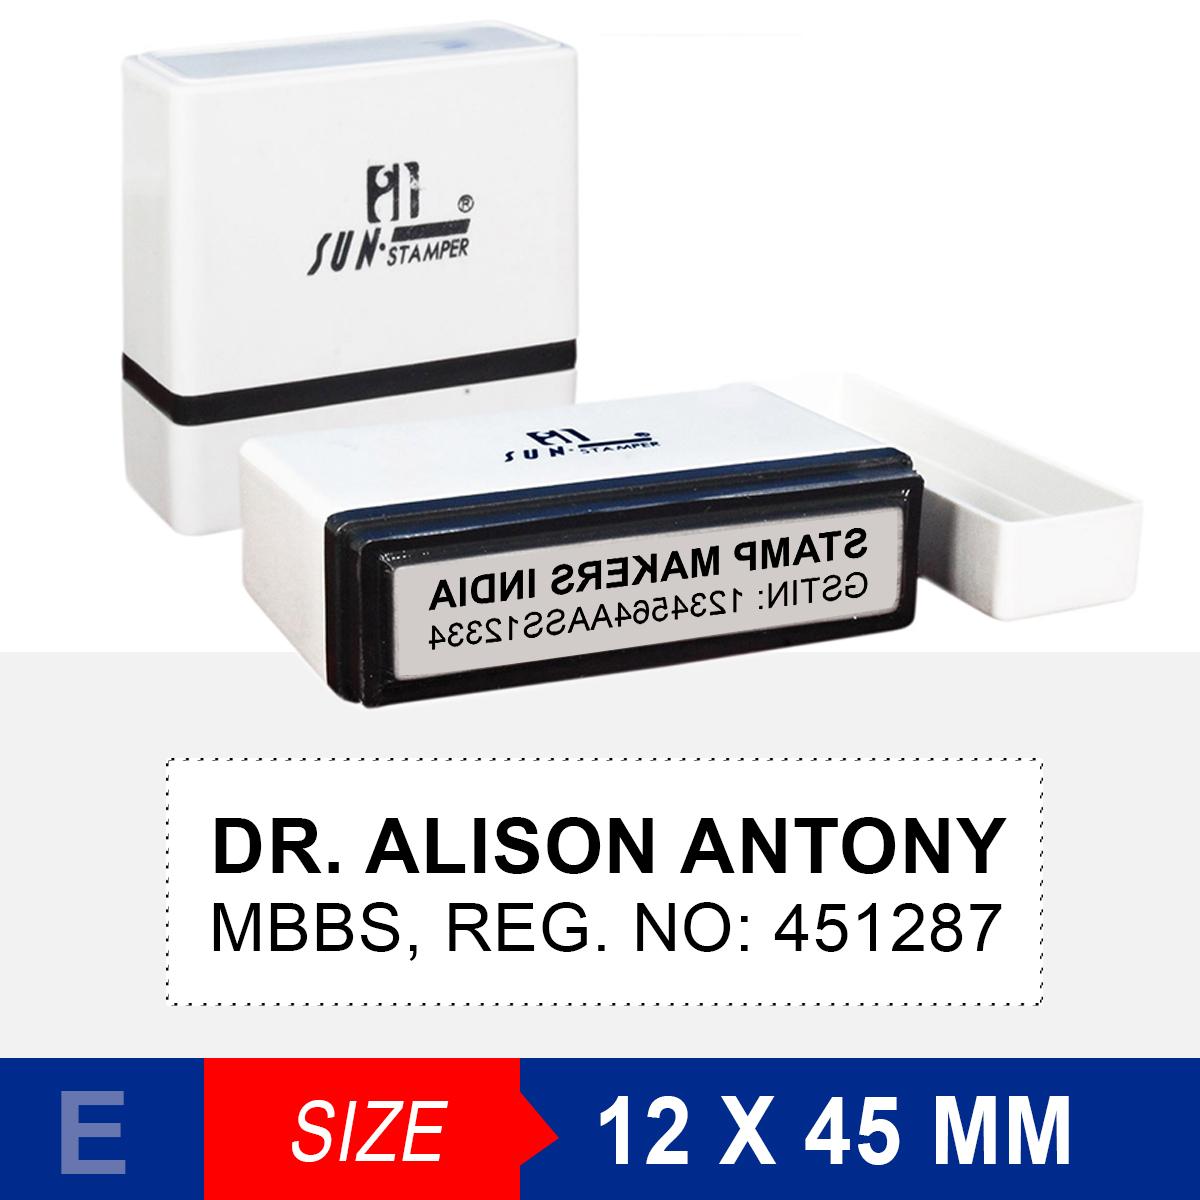 Doctors Stamp 12x45 Mm Sun Stamp Online Stamp